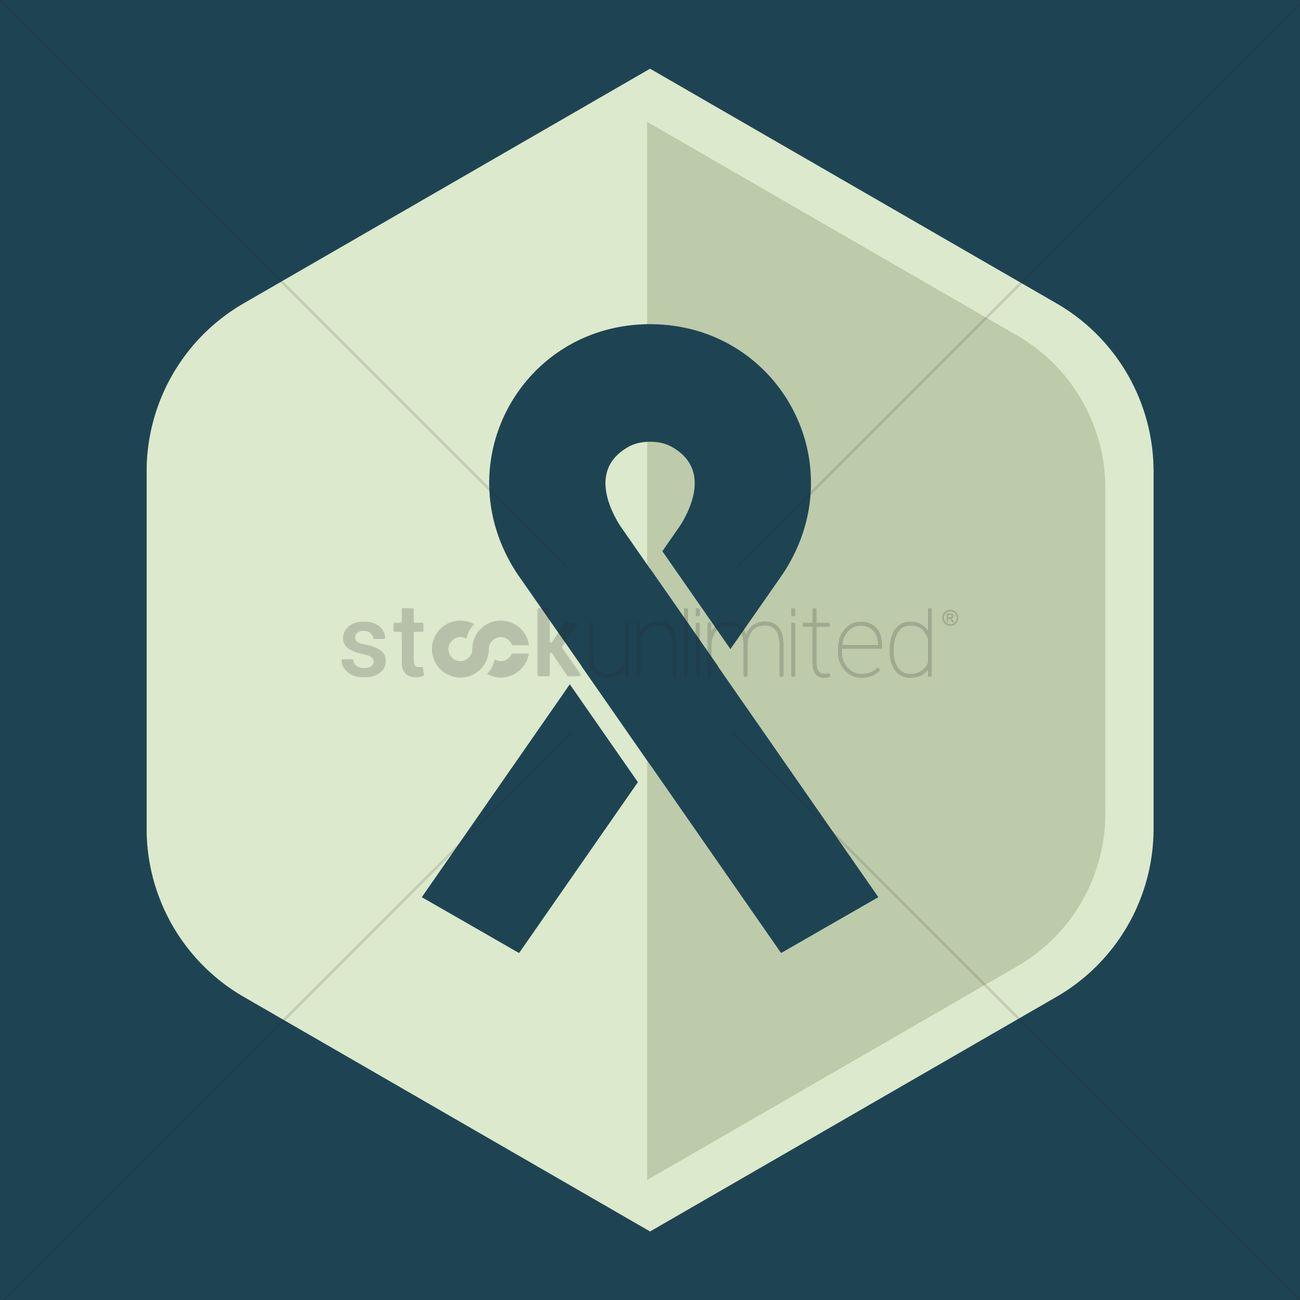 1300x1300 Free Aids Awareness Ribbon Vector Image